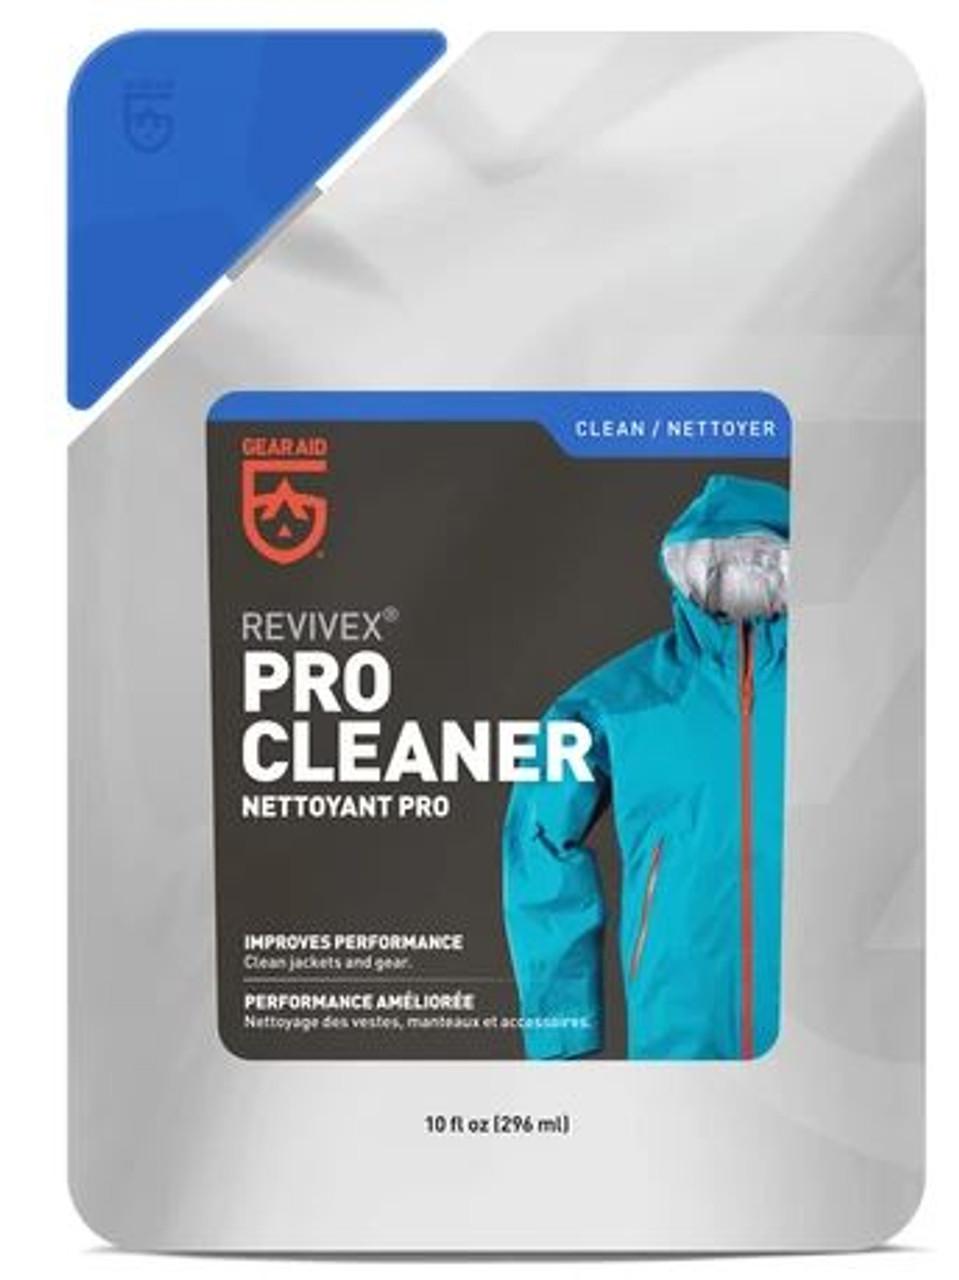 REVIVEX PRO CLEANER